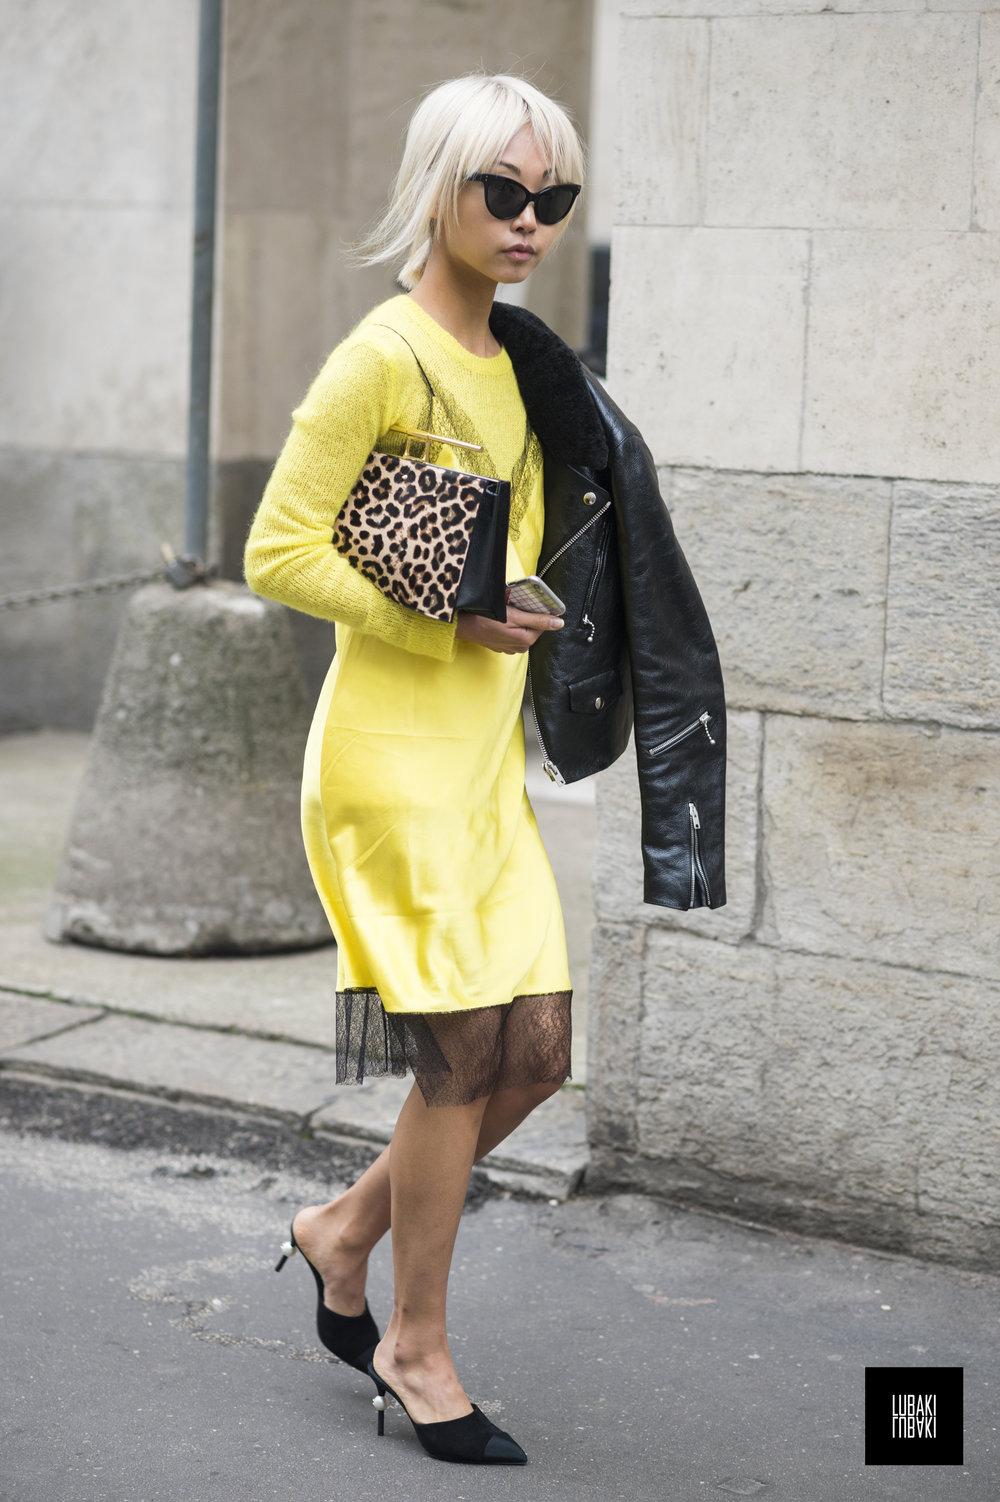 Vanessa Hong - Milan